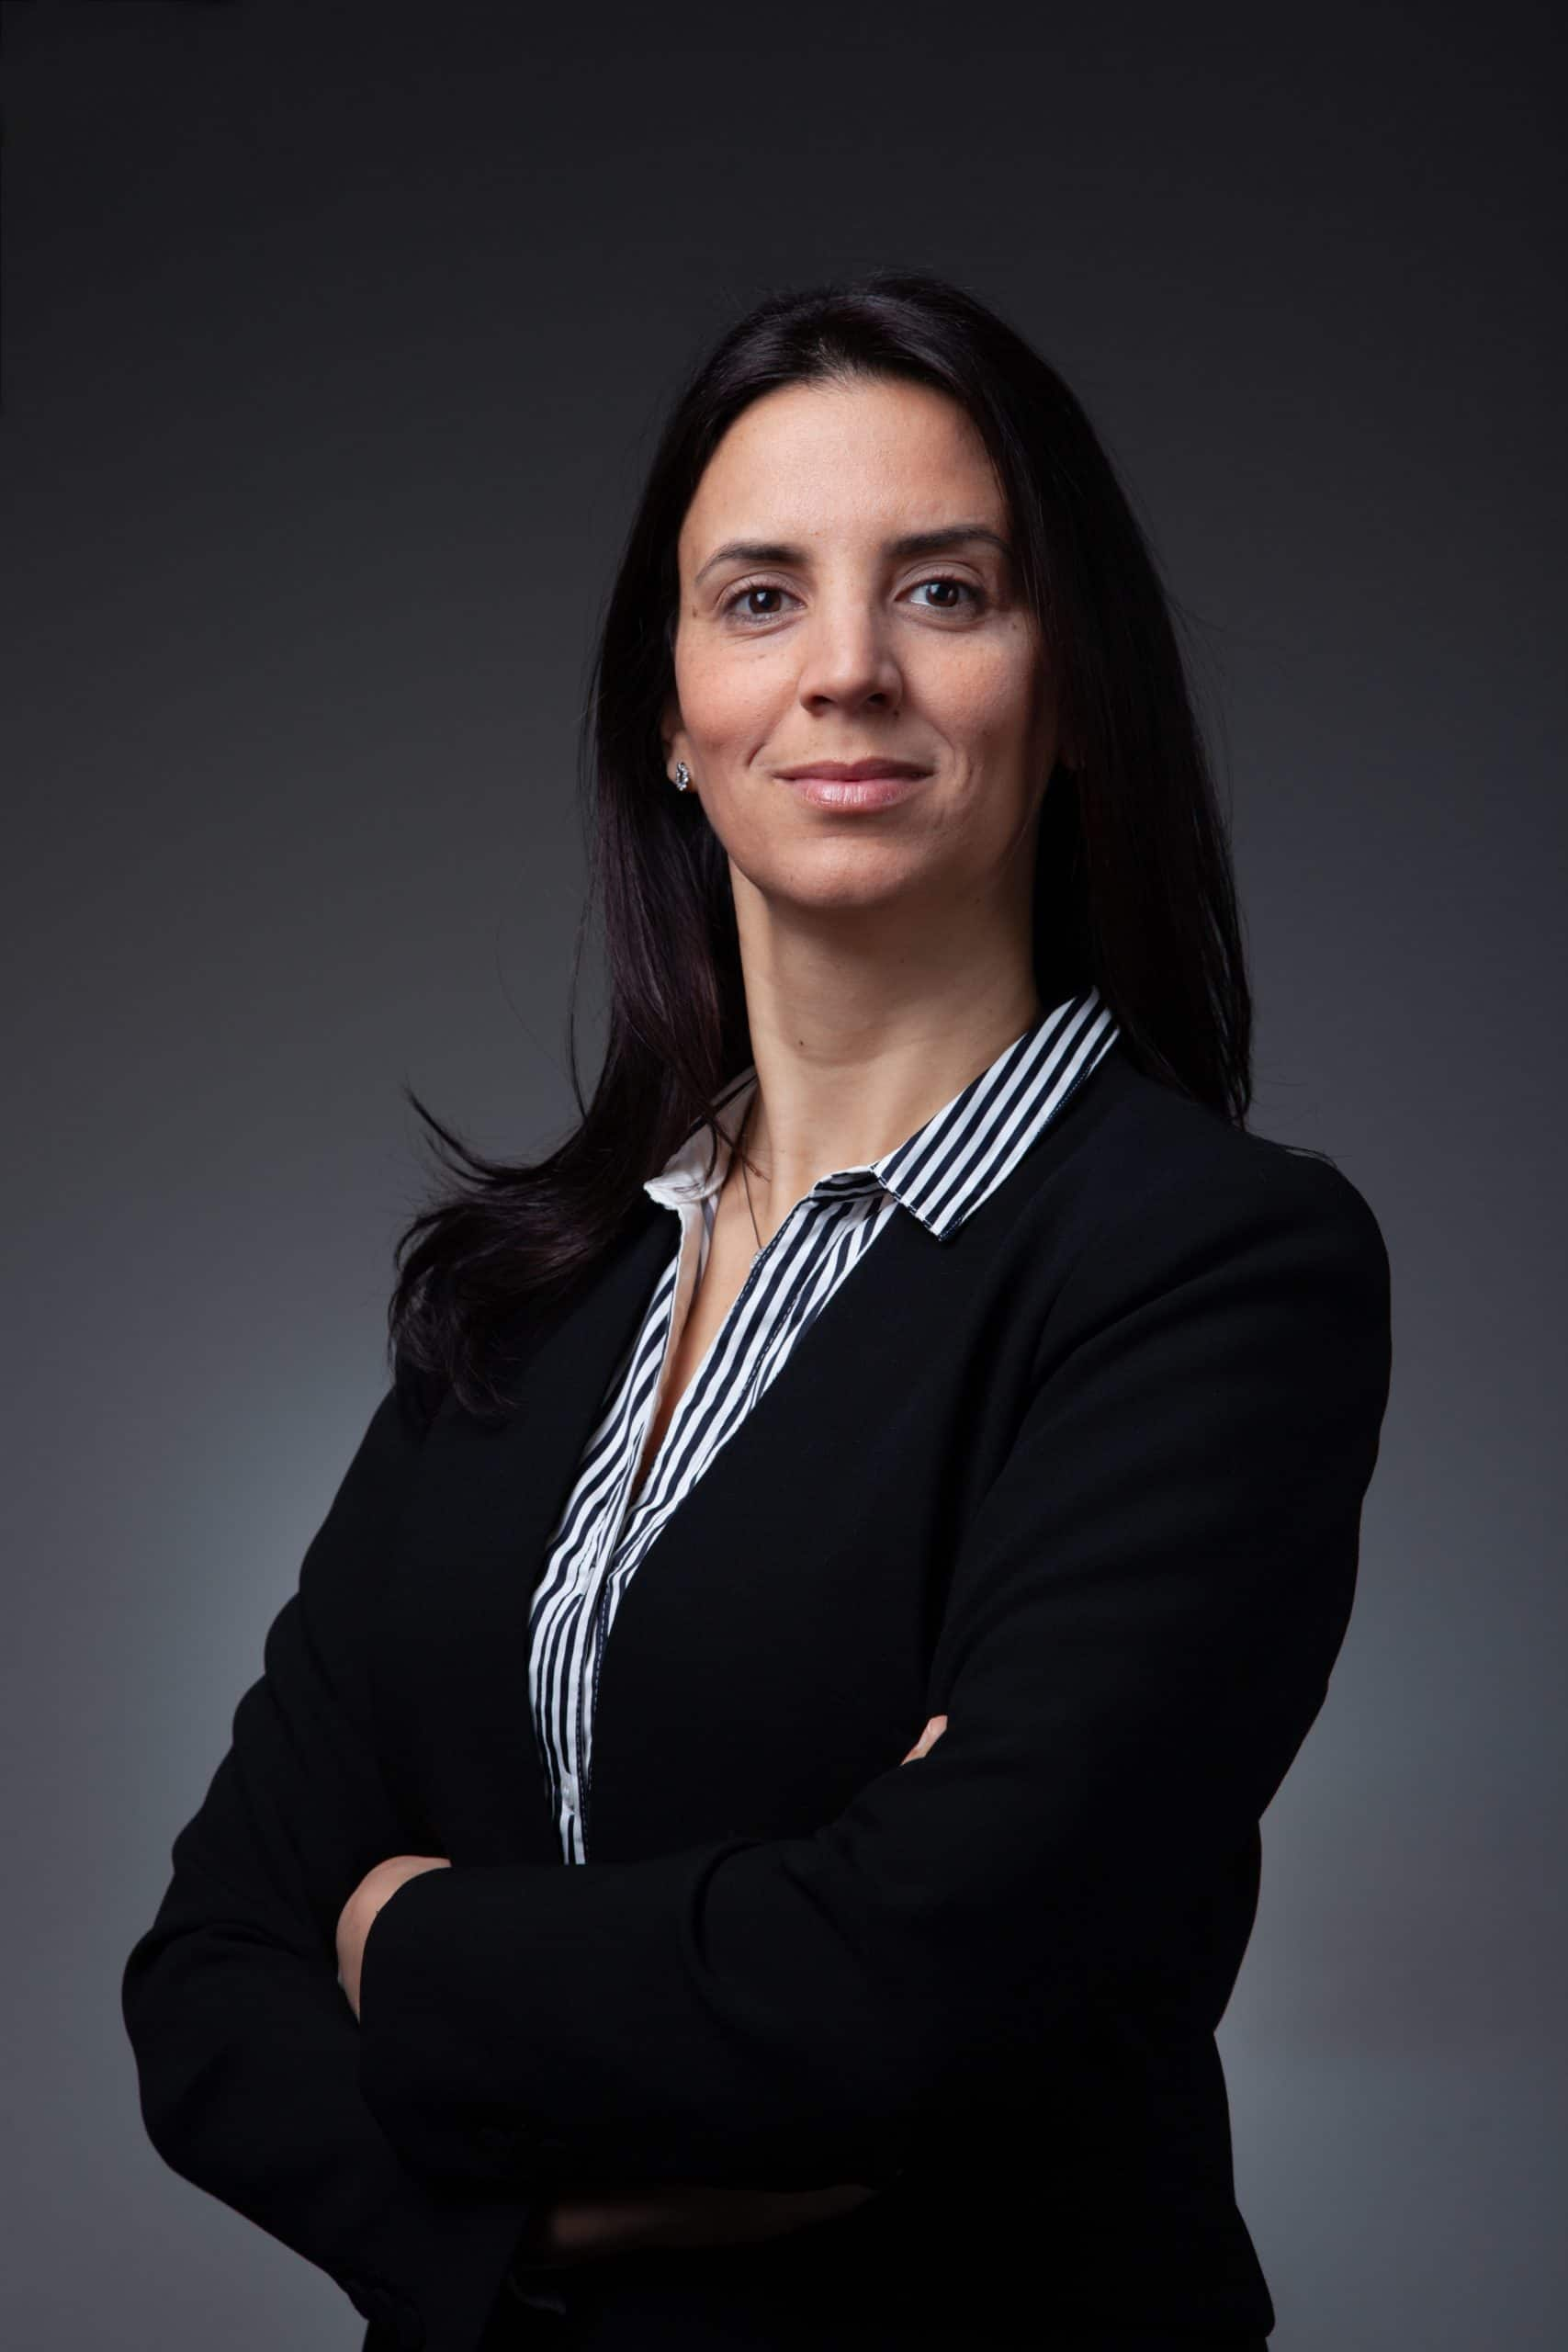 Lilia Gharbi